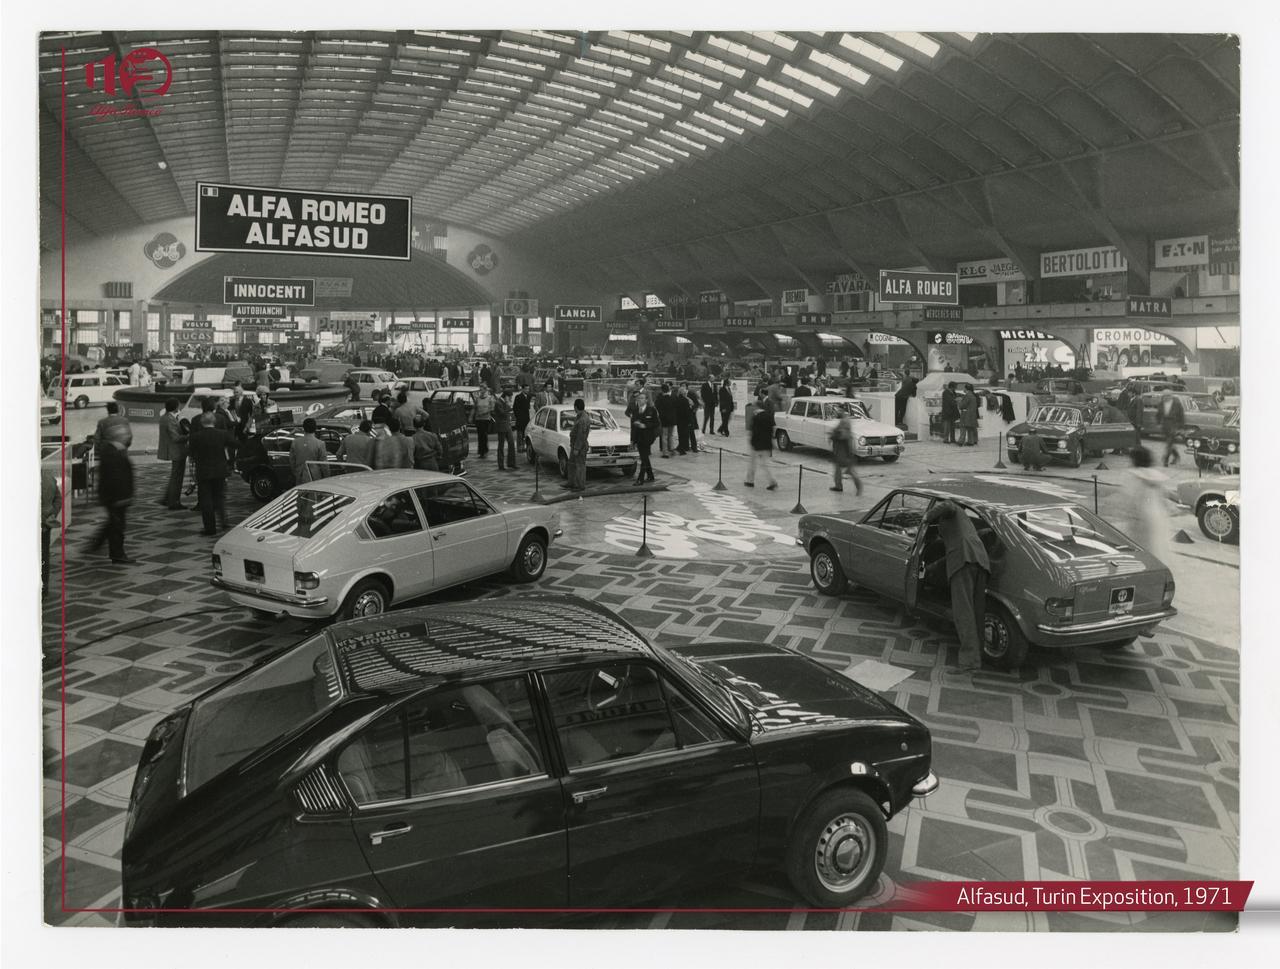 rsz_alfasud-turin-exposition-1971_eng.jpg